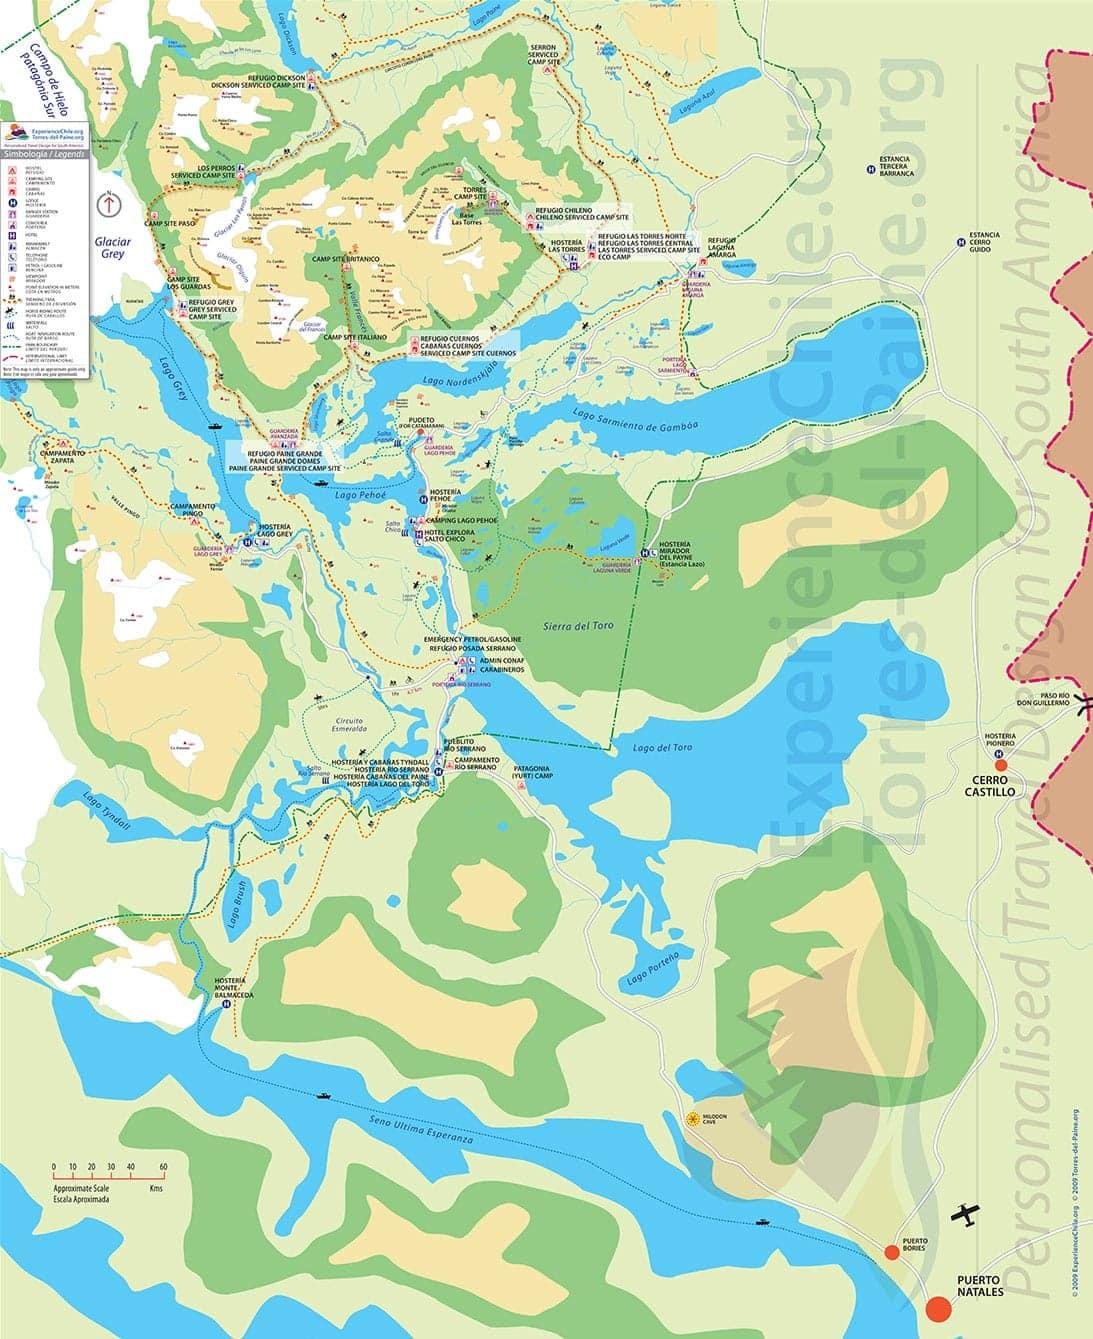 Mapa Torres del Paine - Puerto Natales